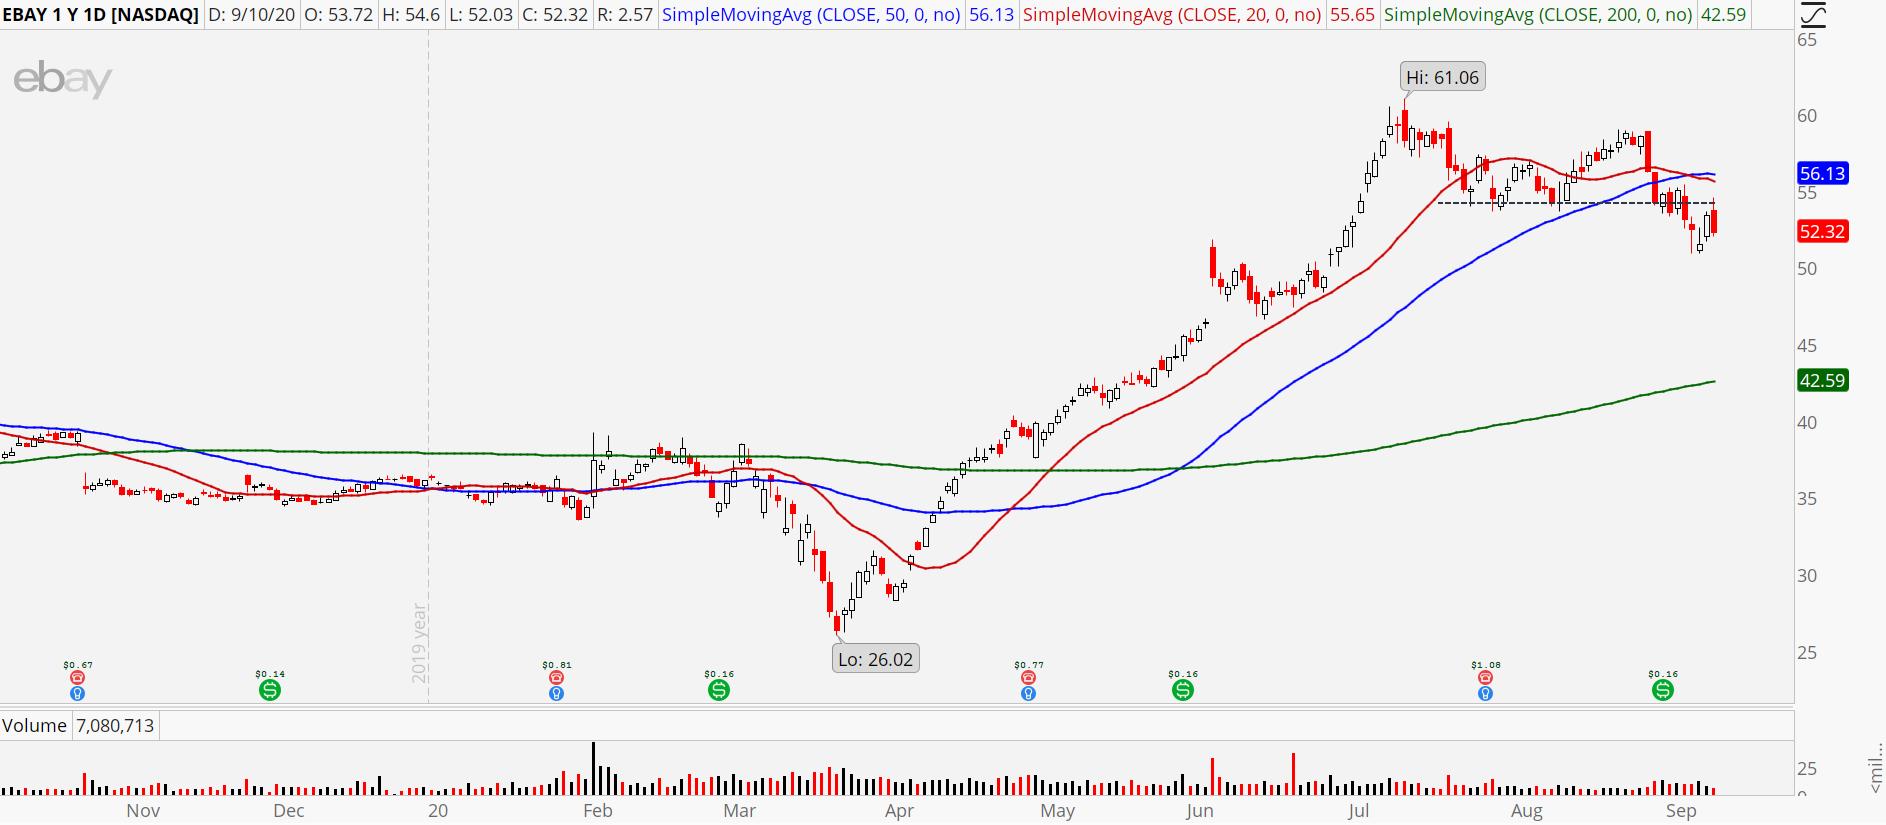 Ebay (EBAY) chart showing a trend reversal